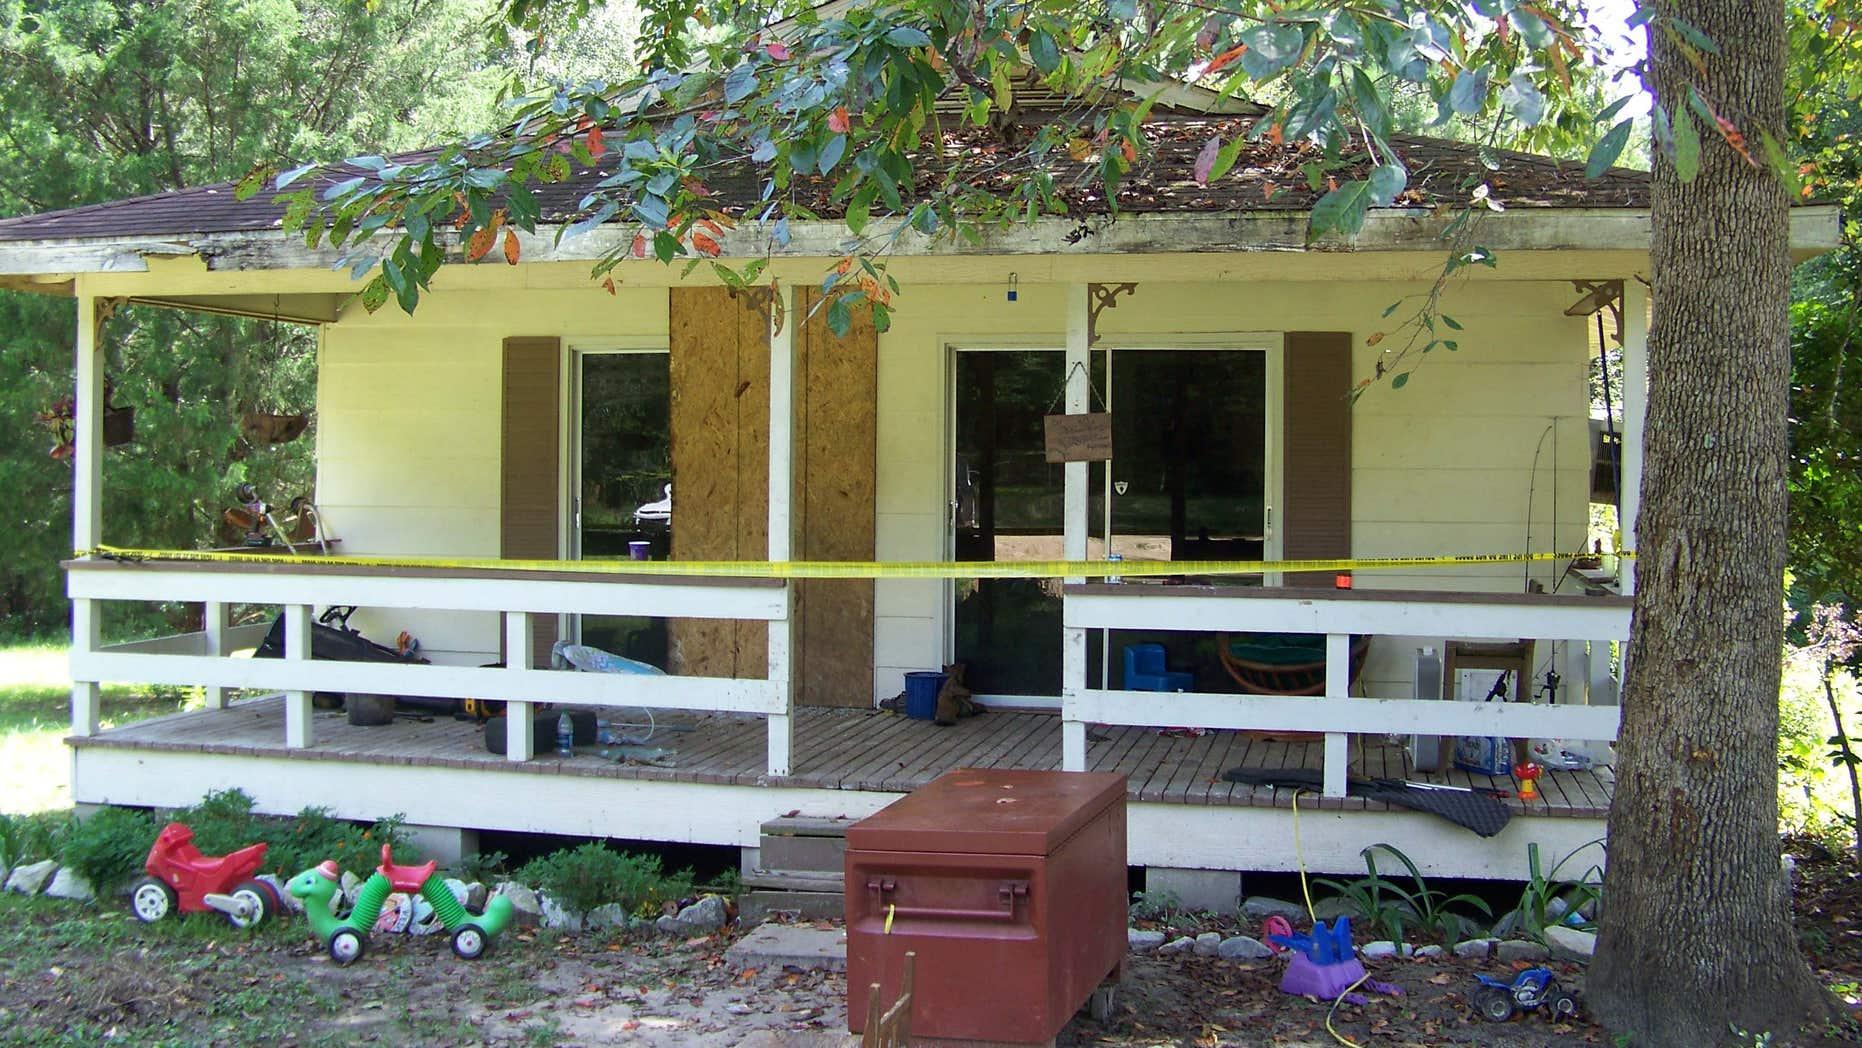 Crime scene tape marks the home on Jim Platt Road near Citronelle, Ala., Sunday, Aug. 21, 2016, where authorities said five people were killed on Saturday.